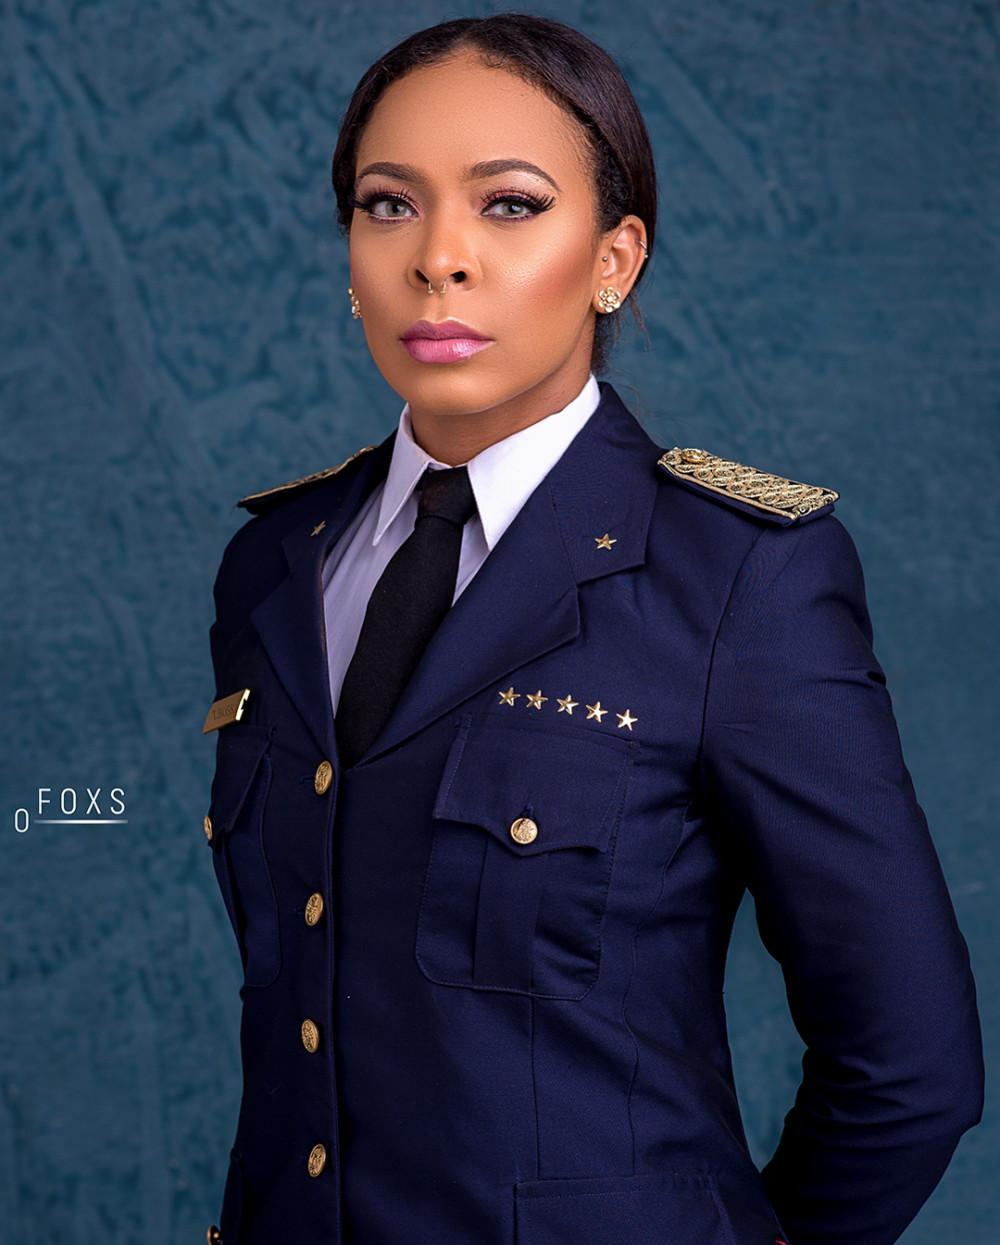 TBoss looks Fab in a Uniform! ?